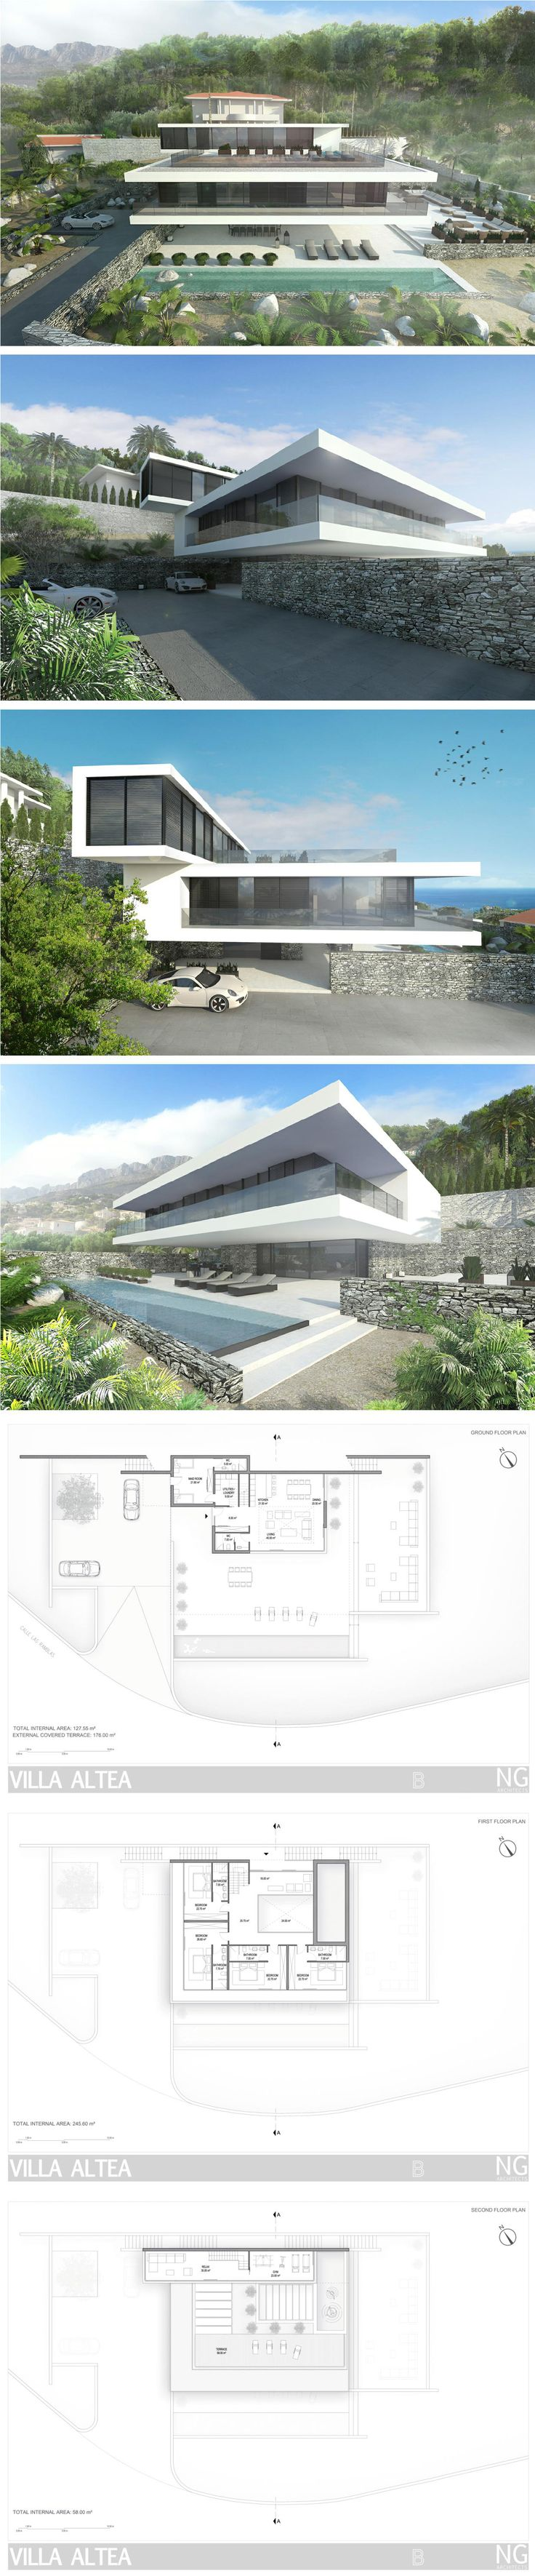 best Idea images on Pinterest Landscaping Architecture